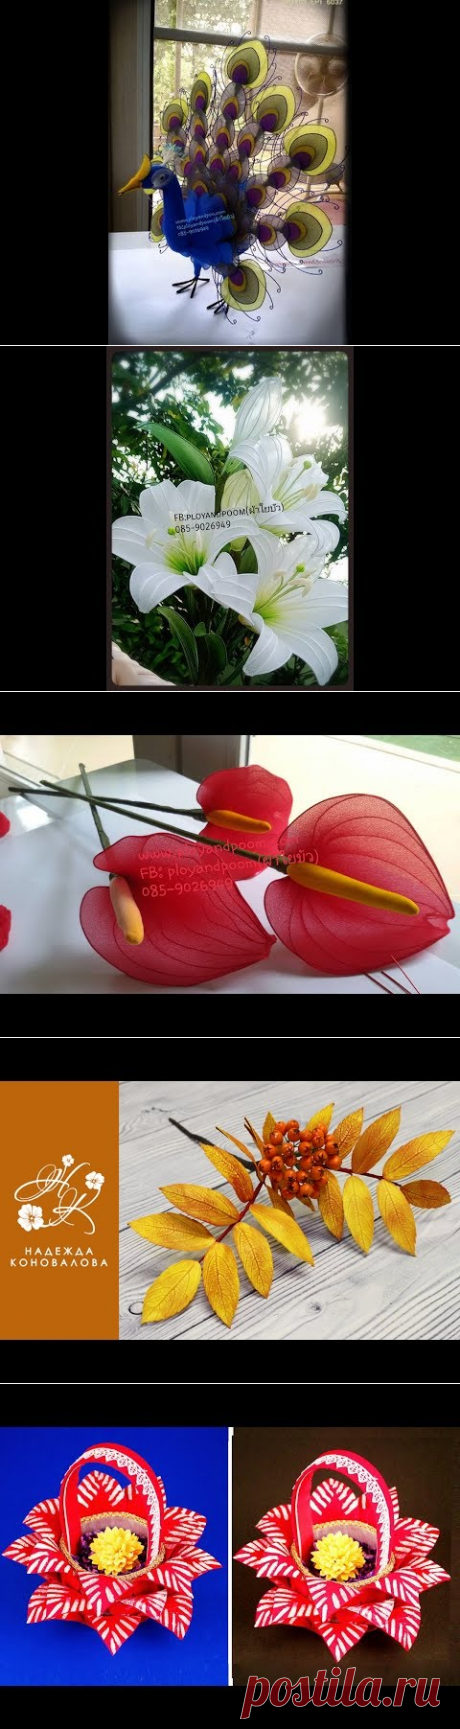 (8421) How to make stocking flower,nylon flower (peacock) by Fb:ployandpoom( ผ้าใยบัว) - YouTube